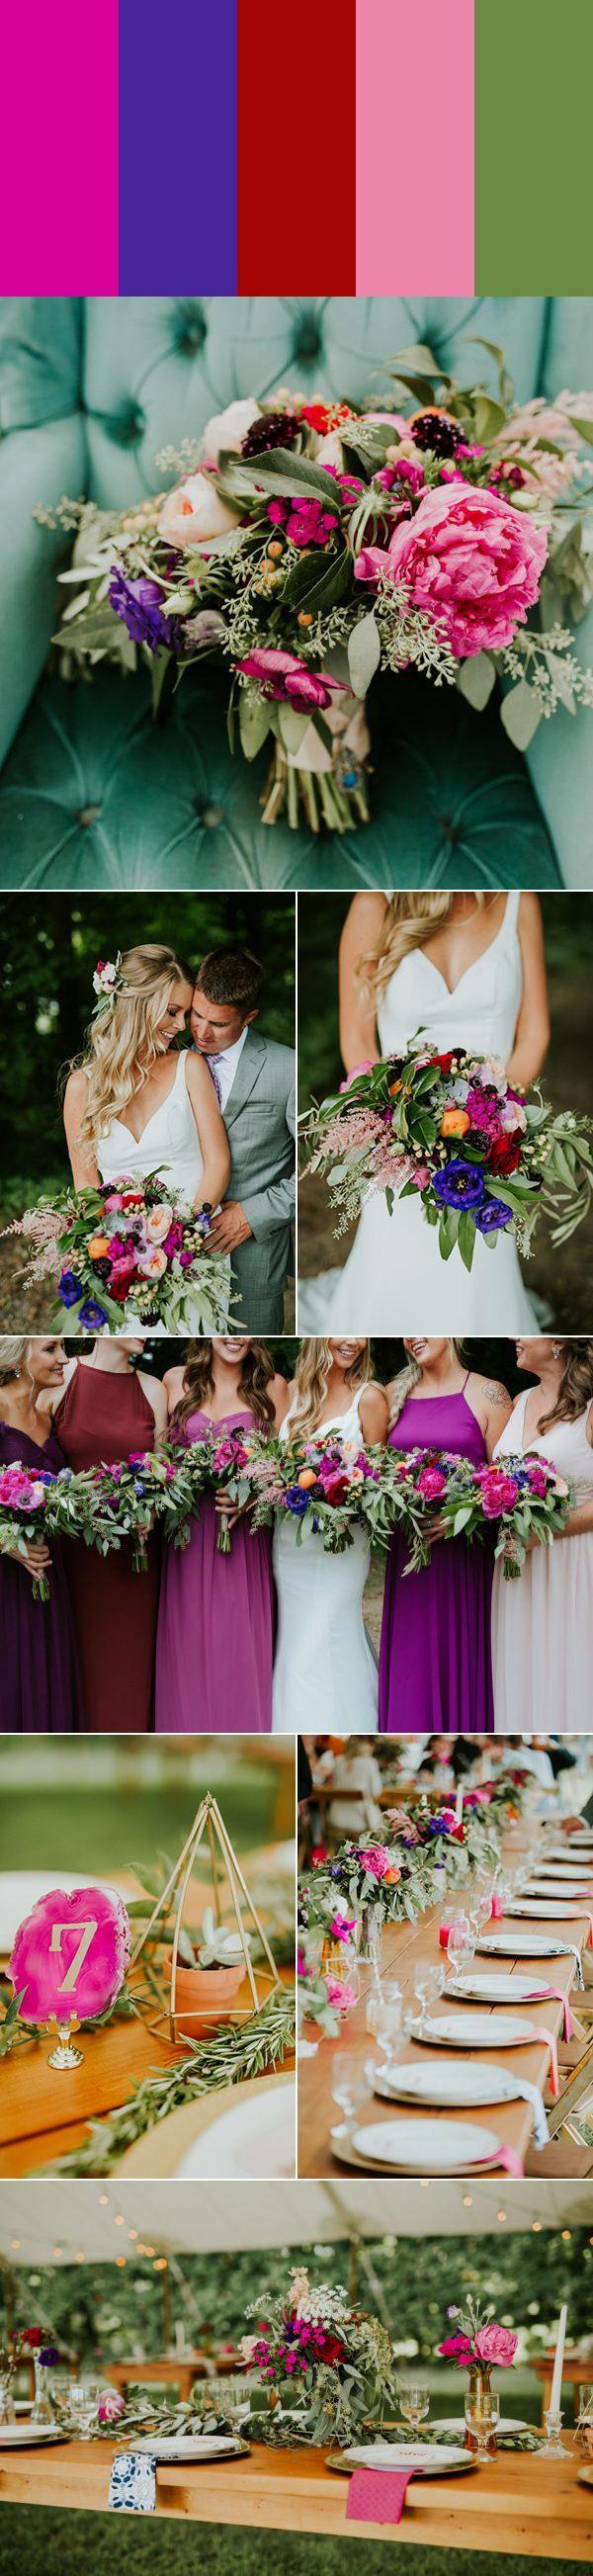 Magenta, indigo, crimson, petal pink, and sage green wedding style | photos by Jamie & Sarah Photography